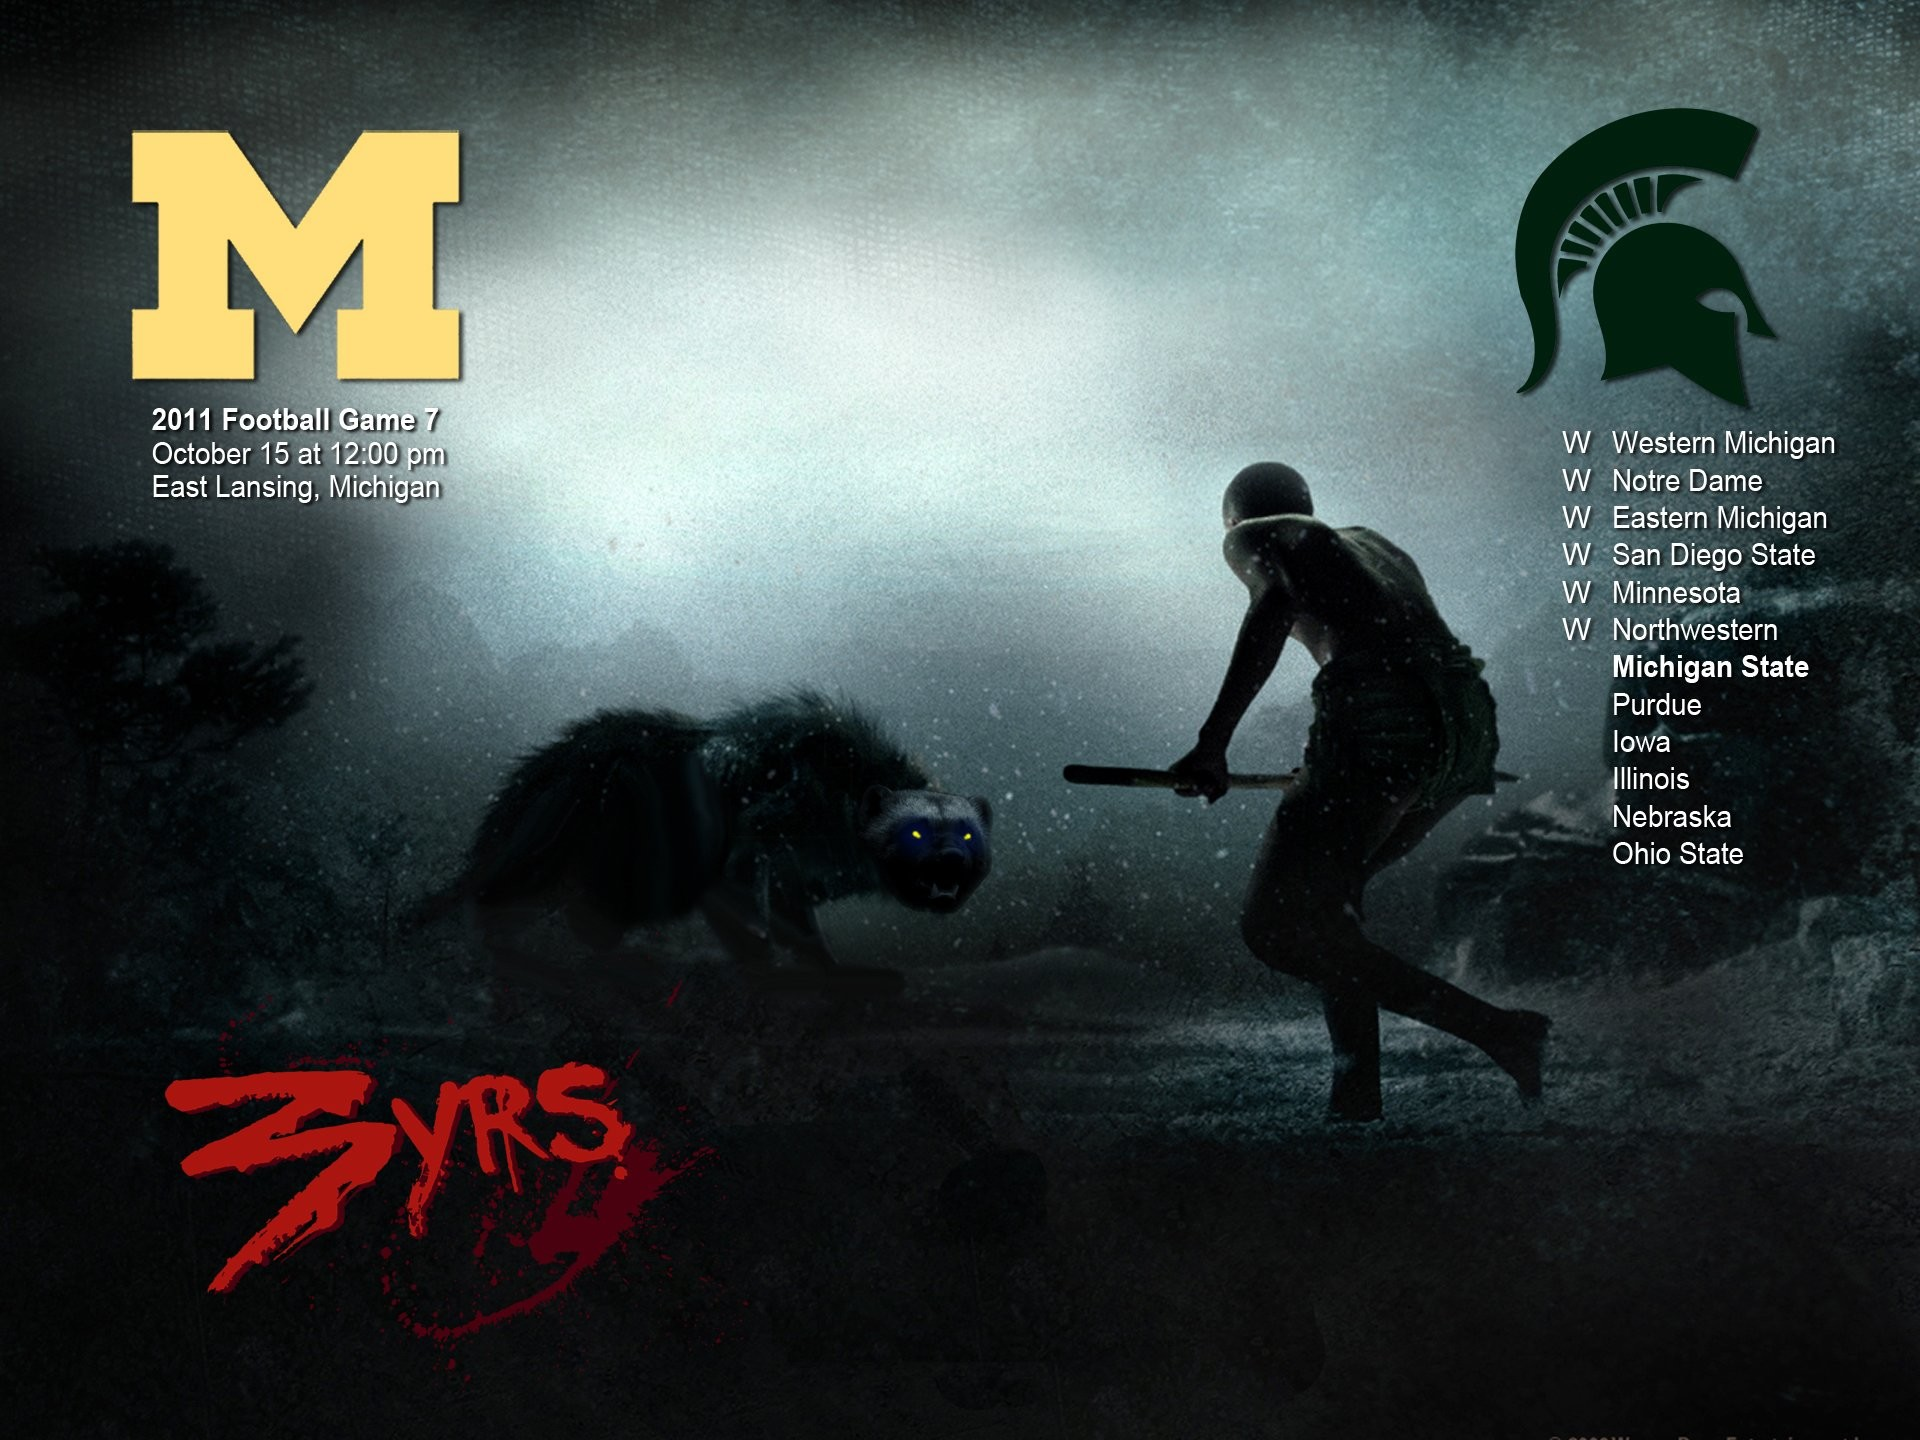 … michigan state spartans college football wallpaper …